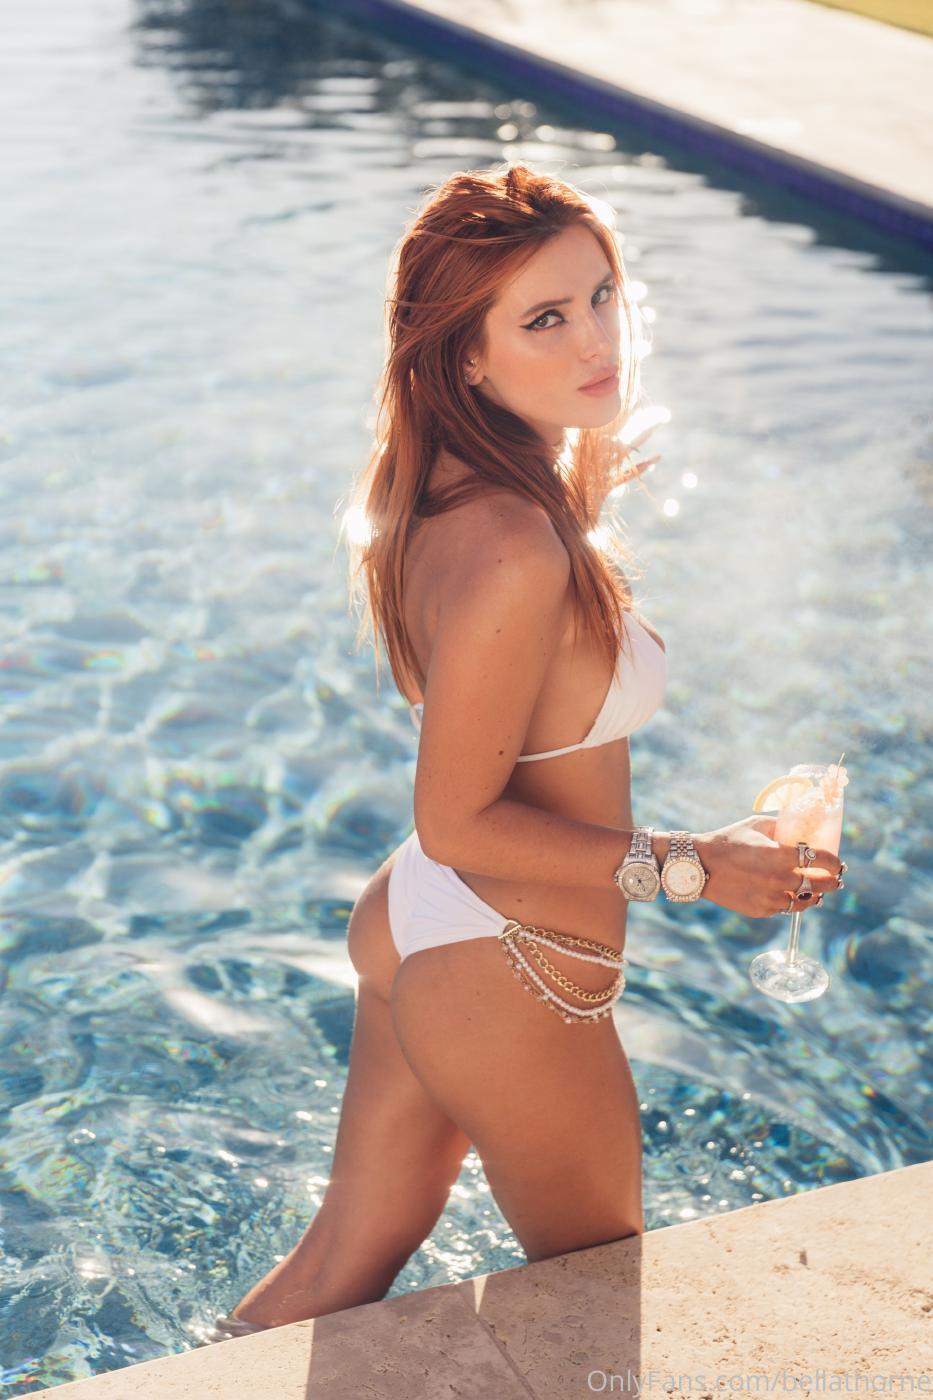 Bella Thorne Pool Bikini Onlyfans Set Leaked 0016